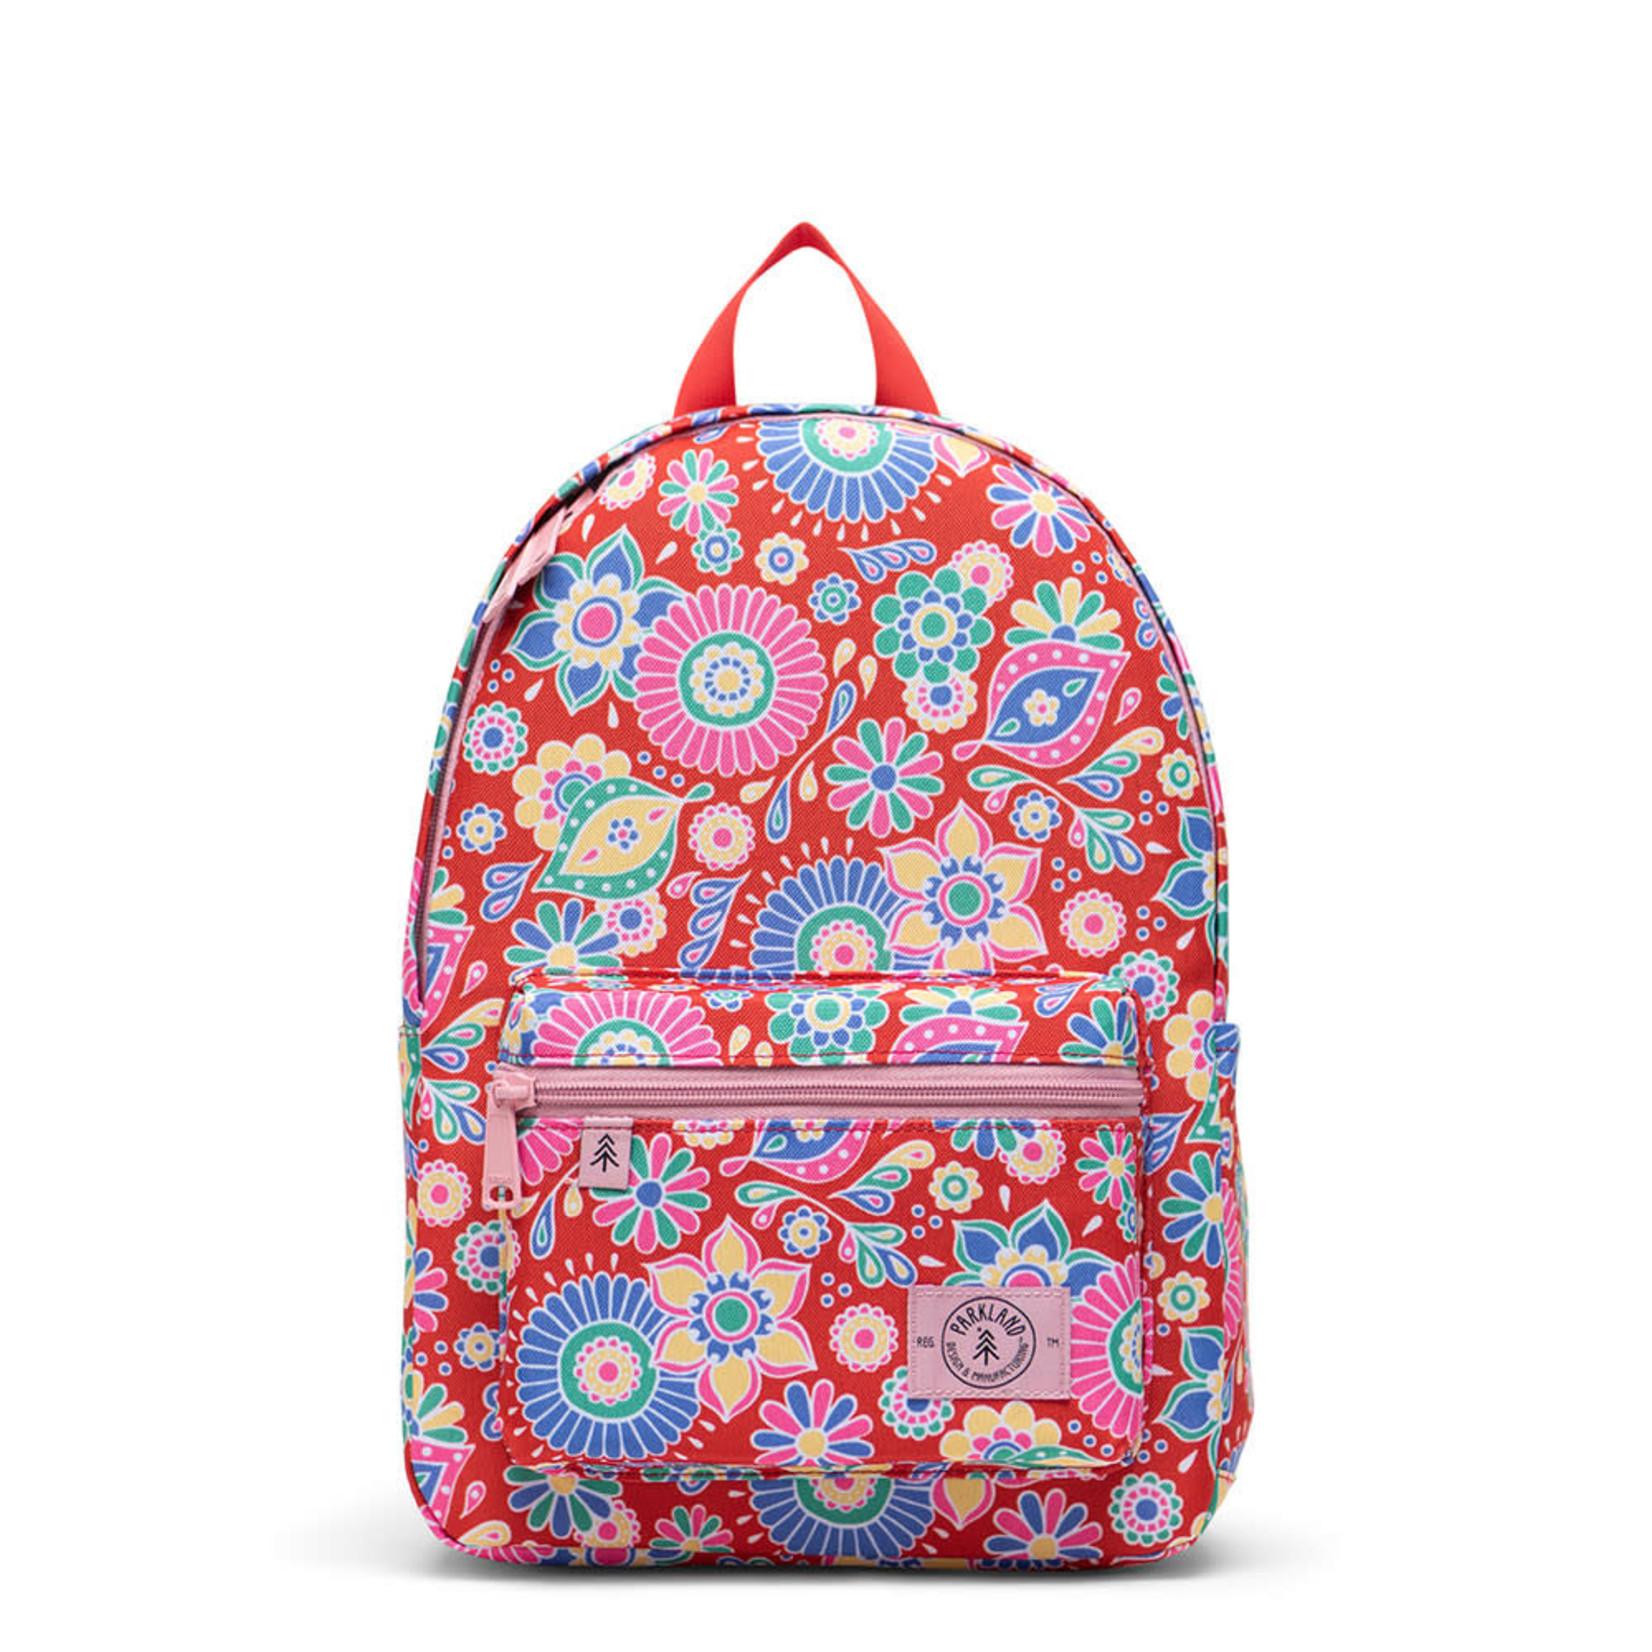 PARKLAND PARKLAND backpack Edison Maravilla